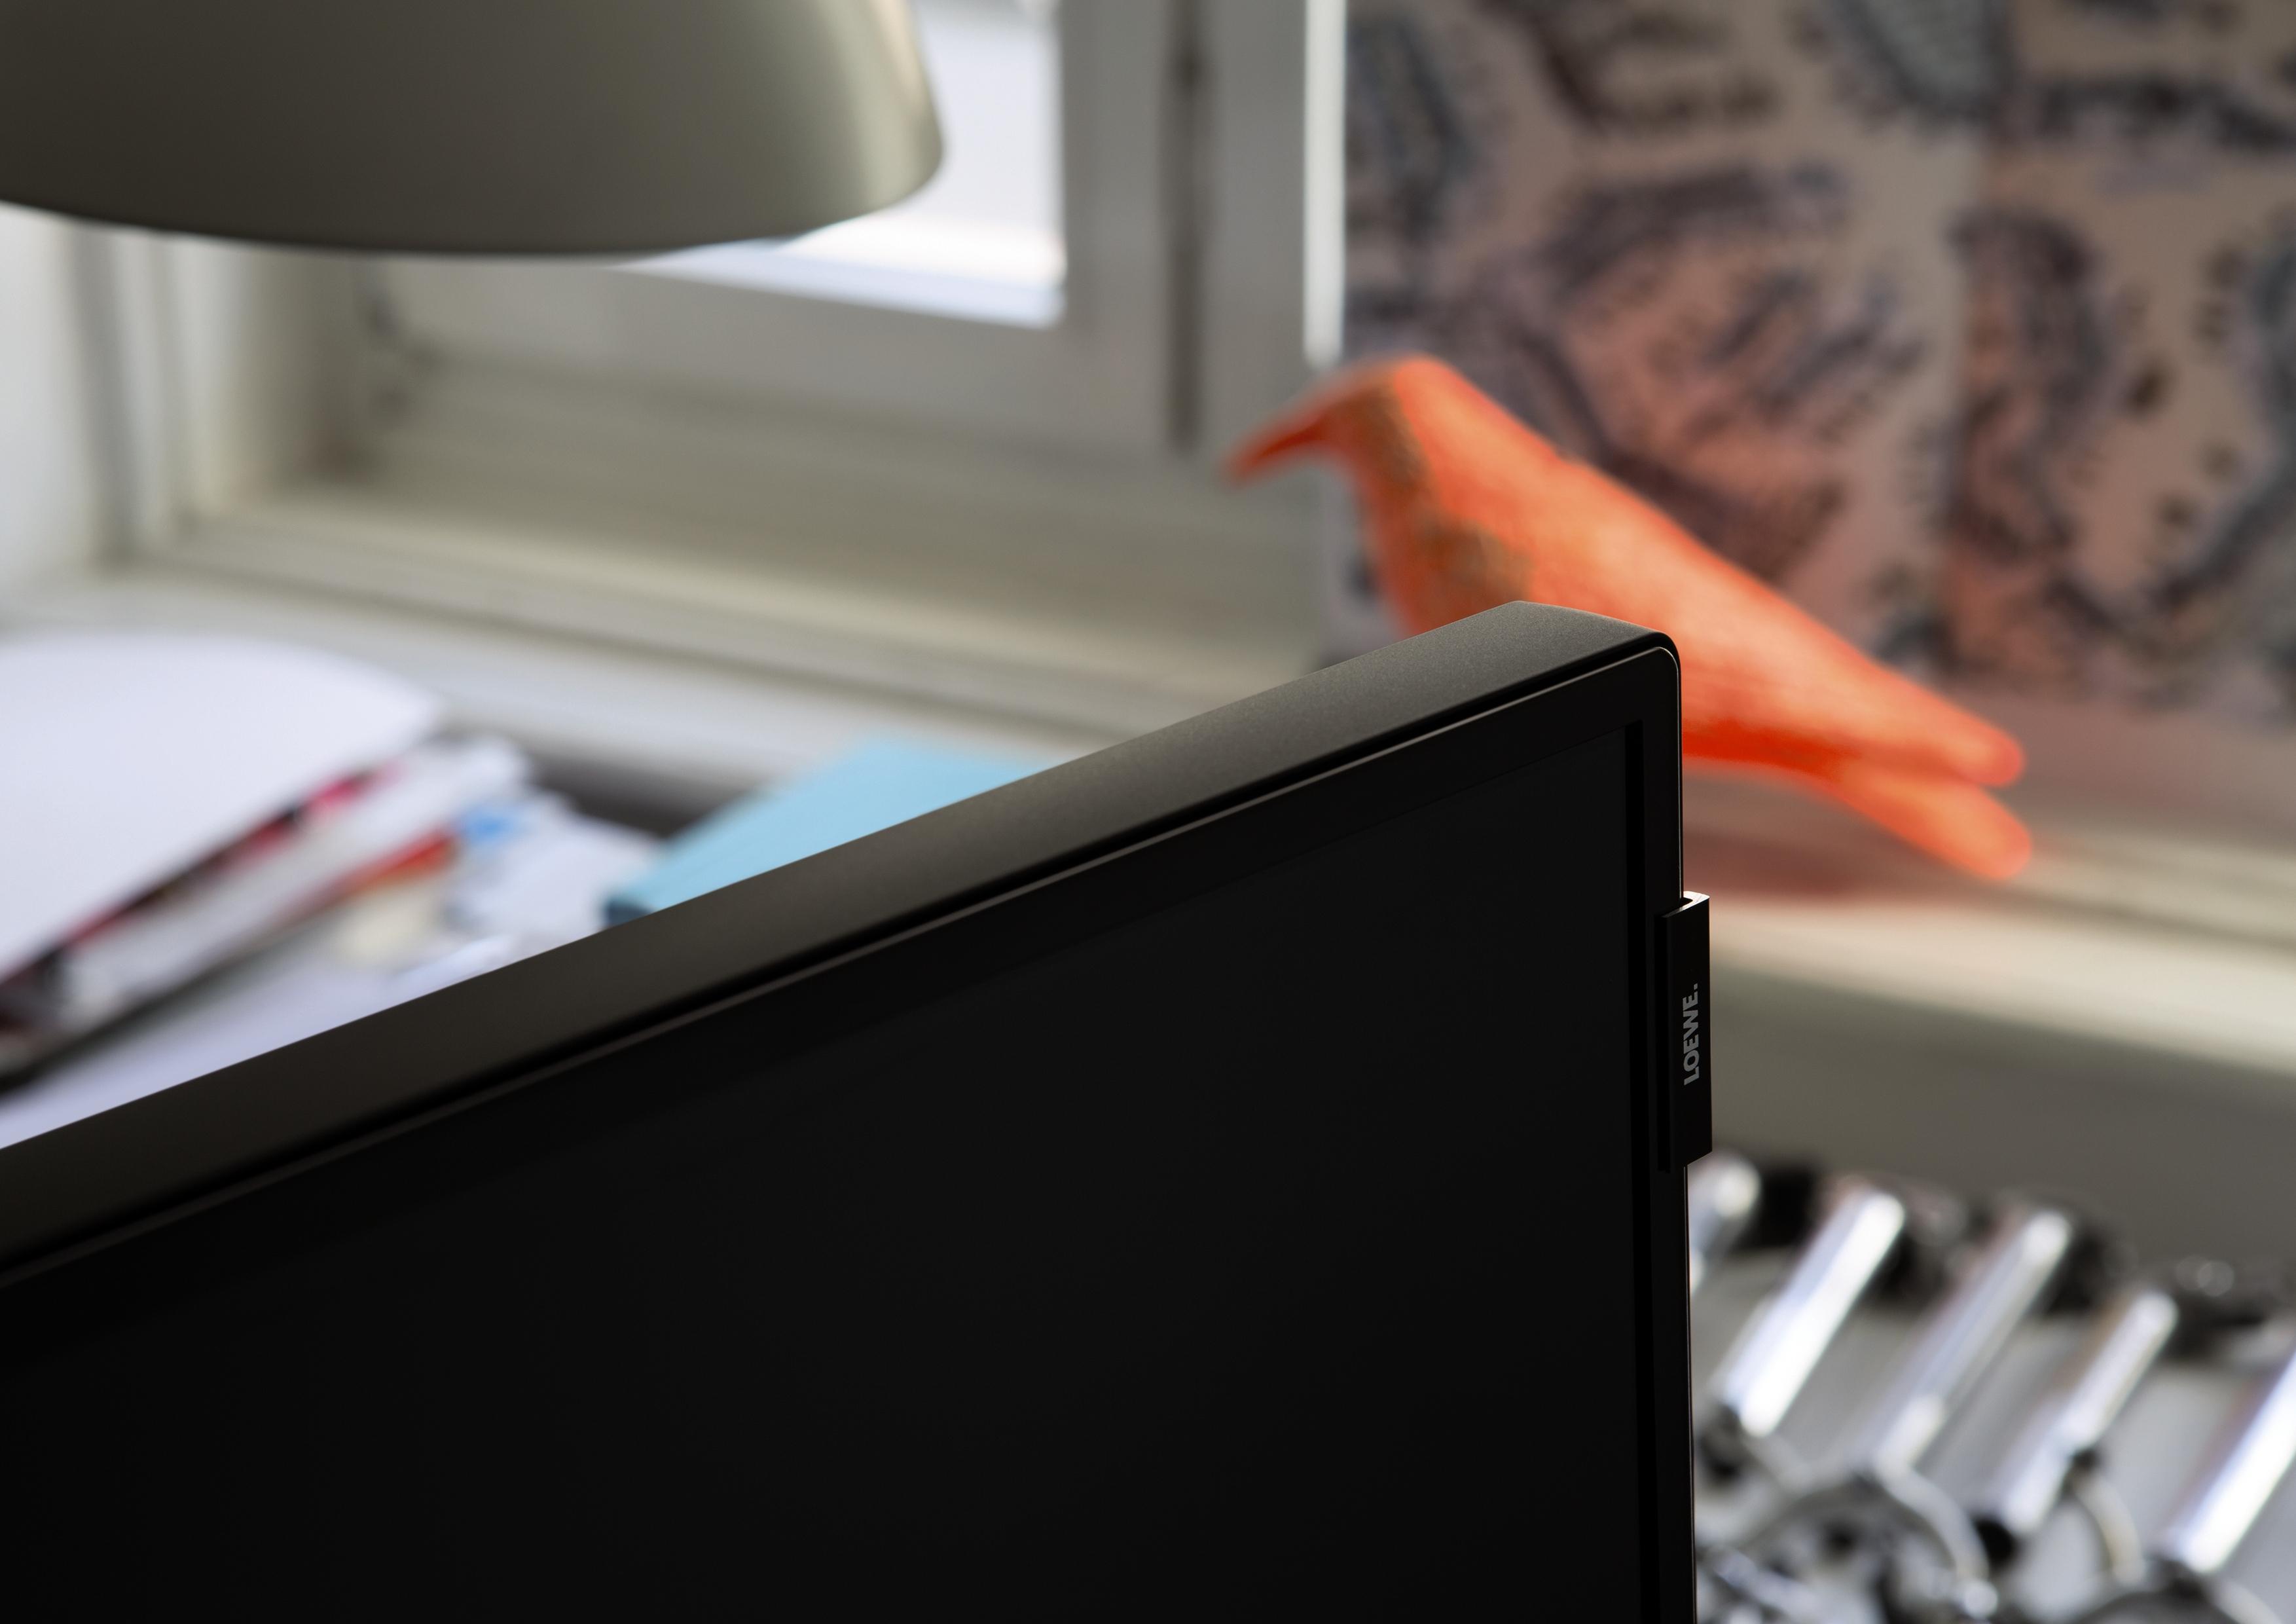 loewe bild luxusn dom c kina a audio. Black Bedroom Furniture Sets. Home Design Ideas